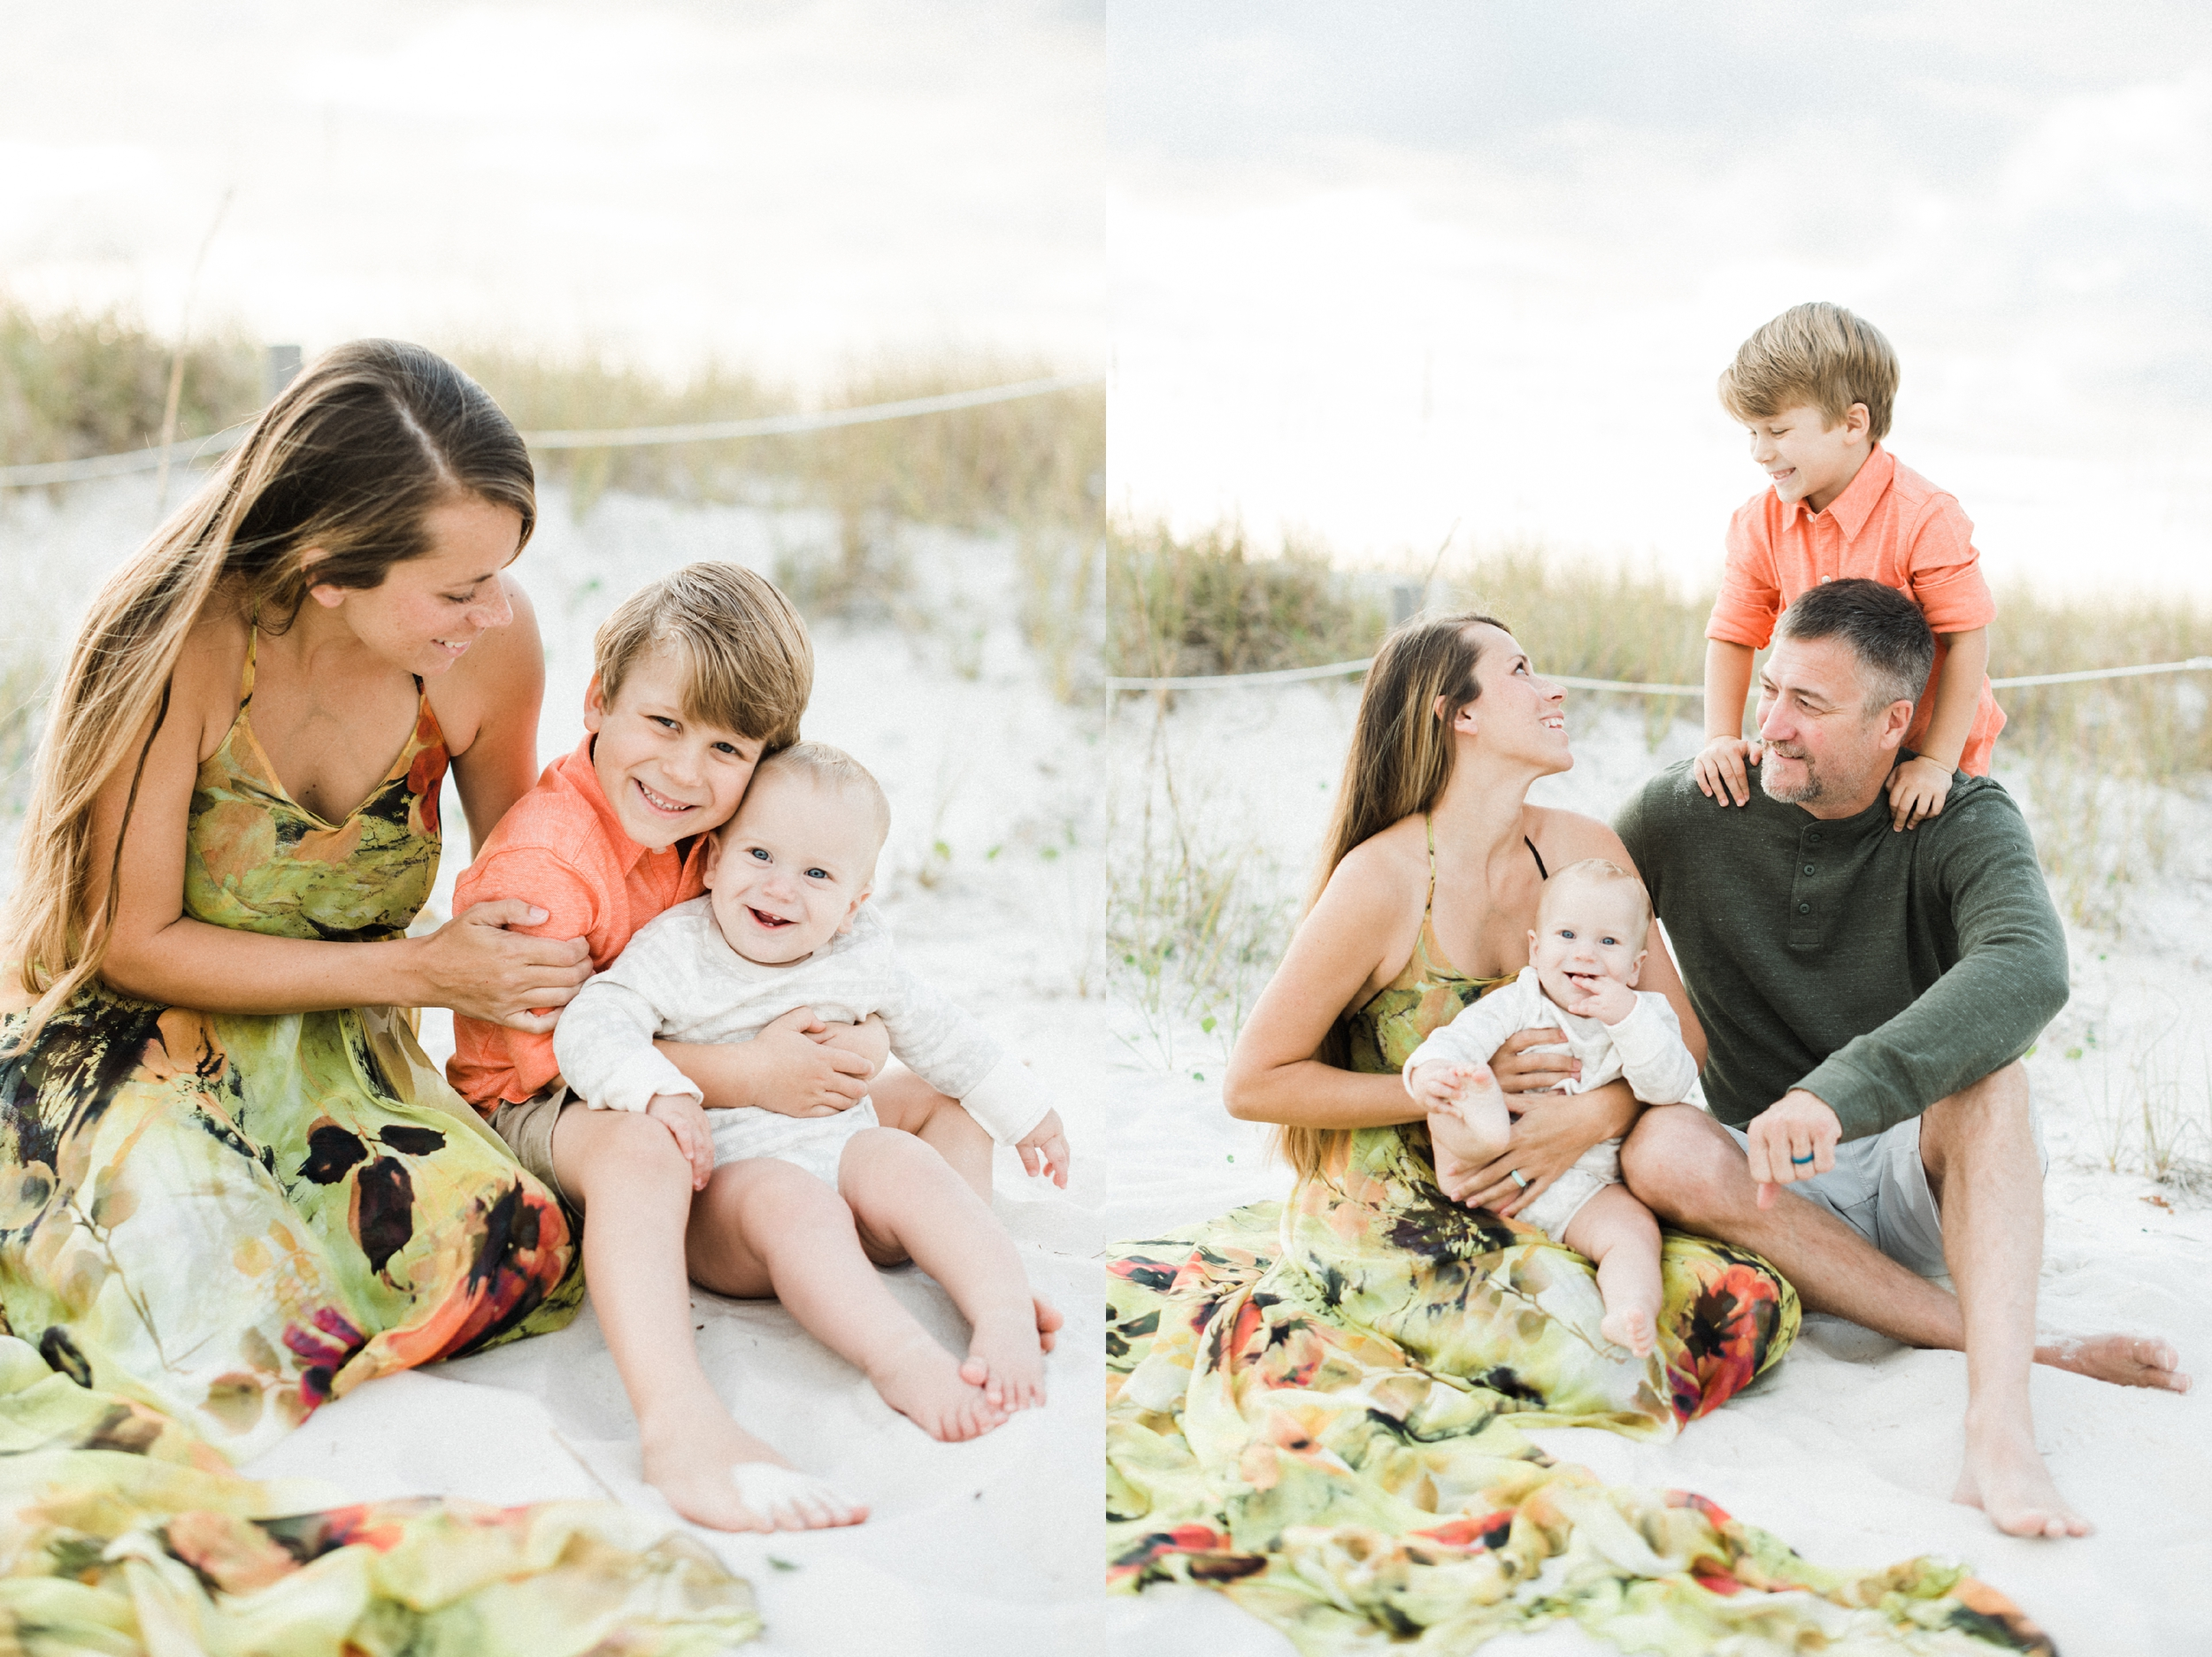 desiree-gardner-photography-pairs-france-monet-garden-monets-couple-wedding-engagement-giverny-30-a-30a-florida_0067.jpg